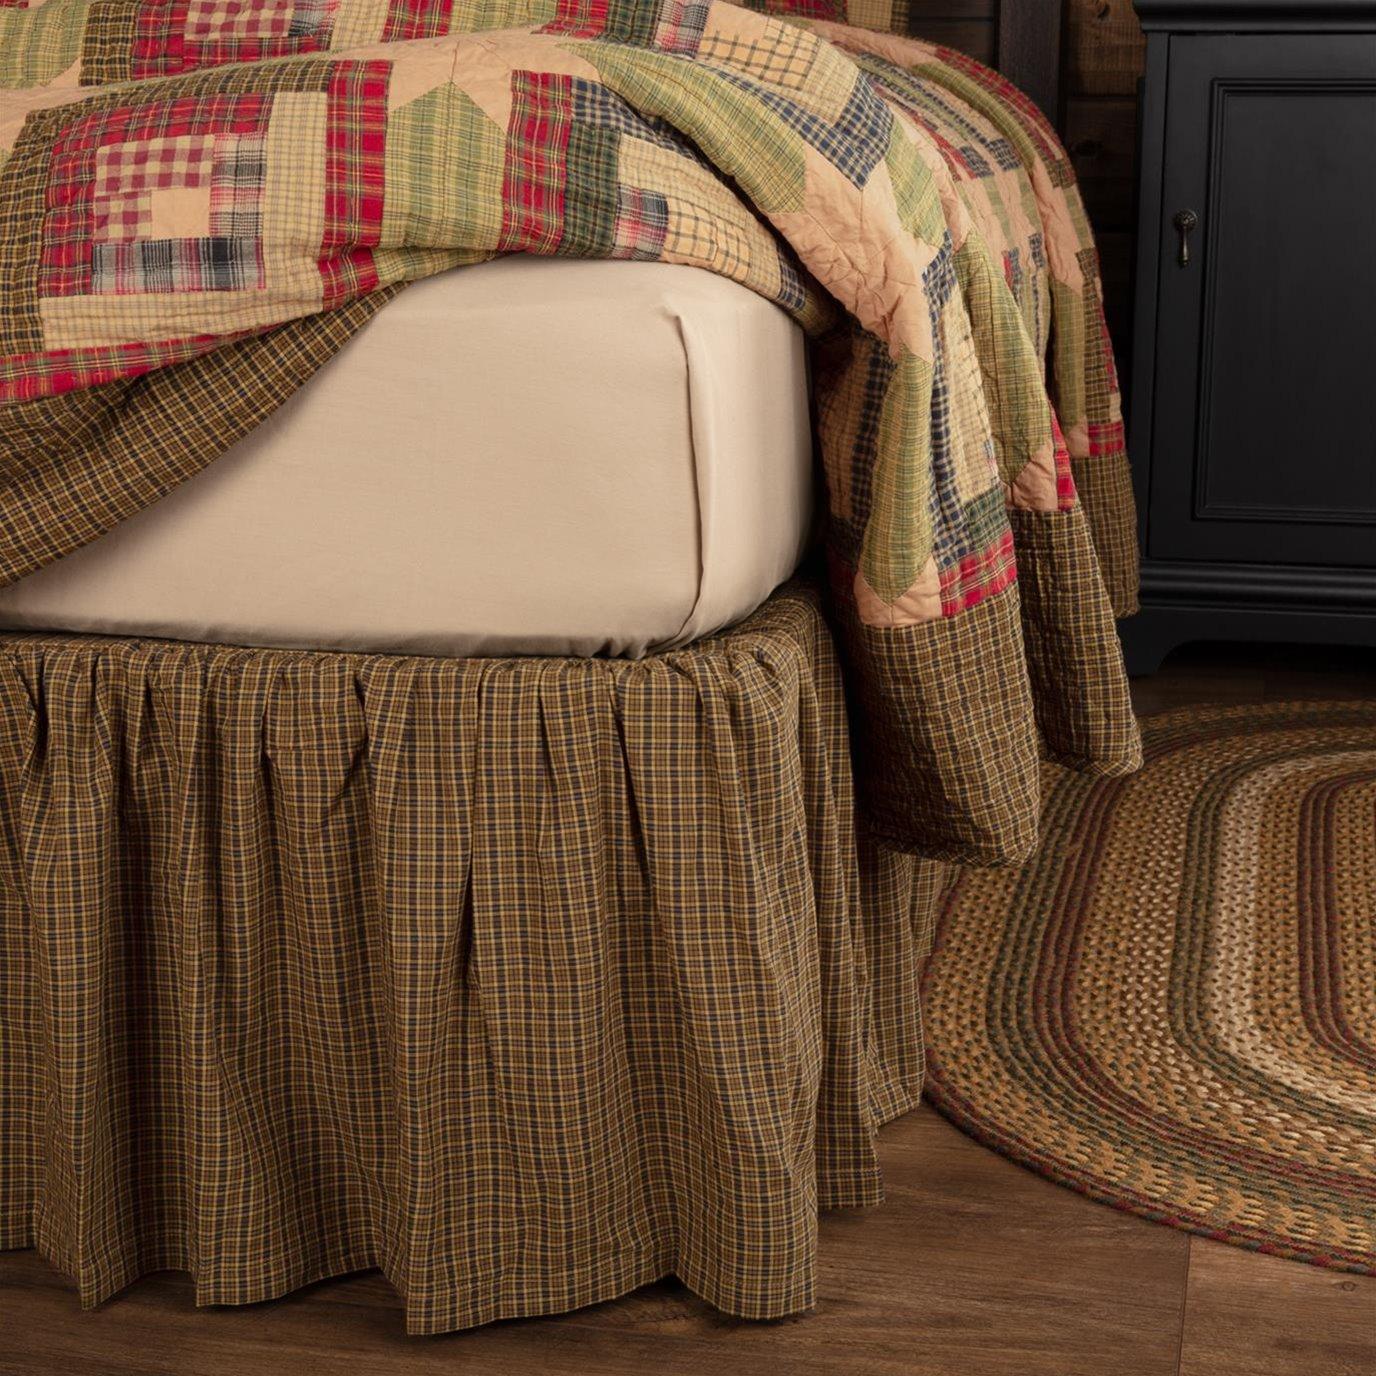 Tea Cabin King Bed Skirt 78x80x16 By Oak Amp Asher